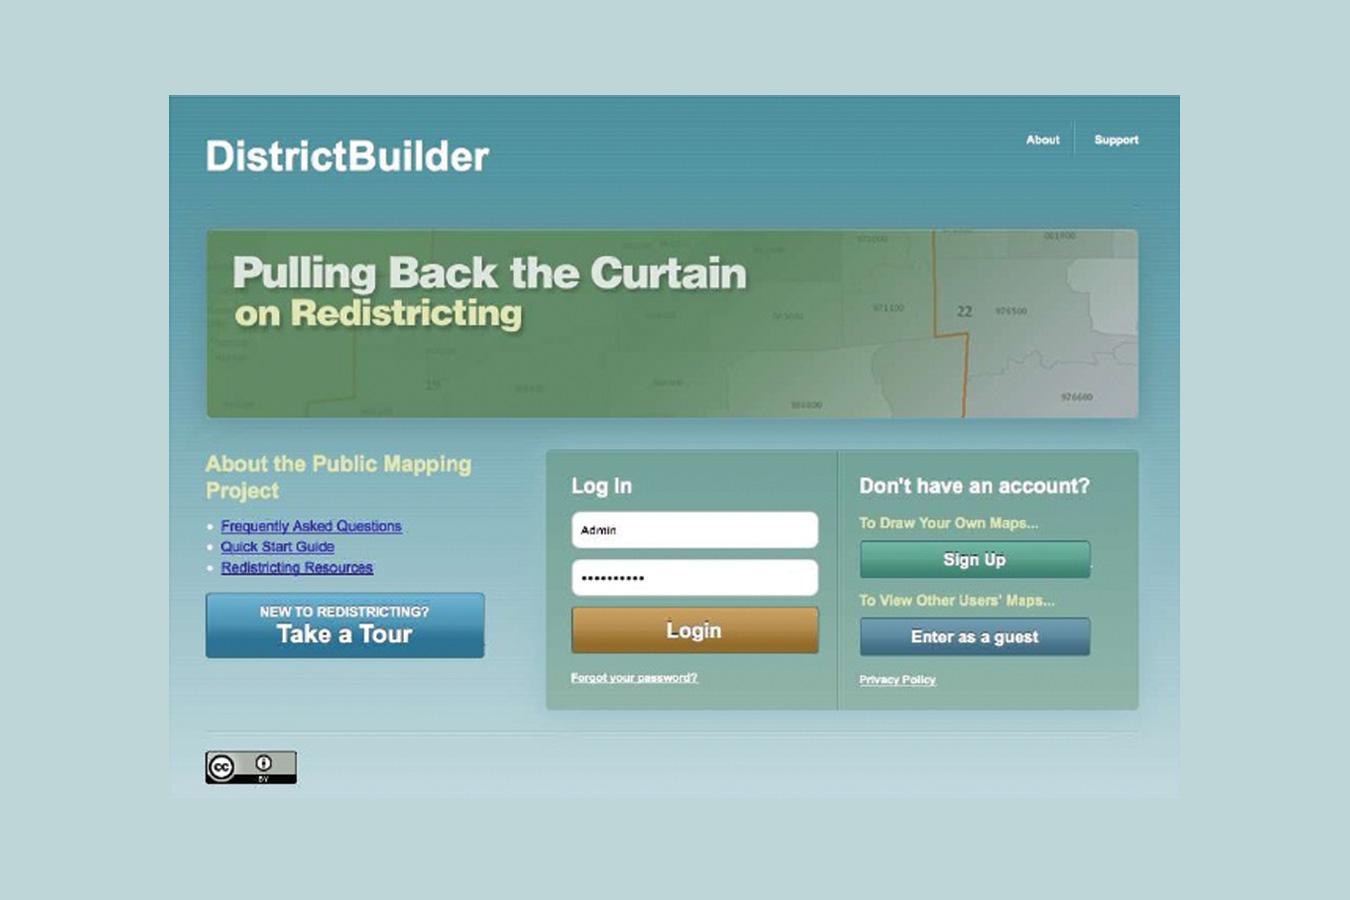 districtbuilder